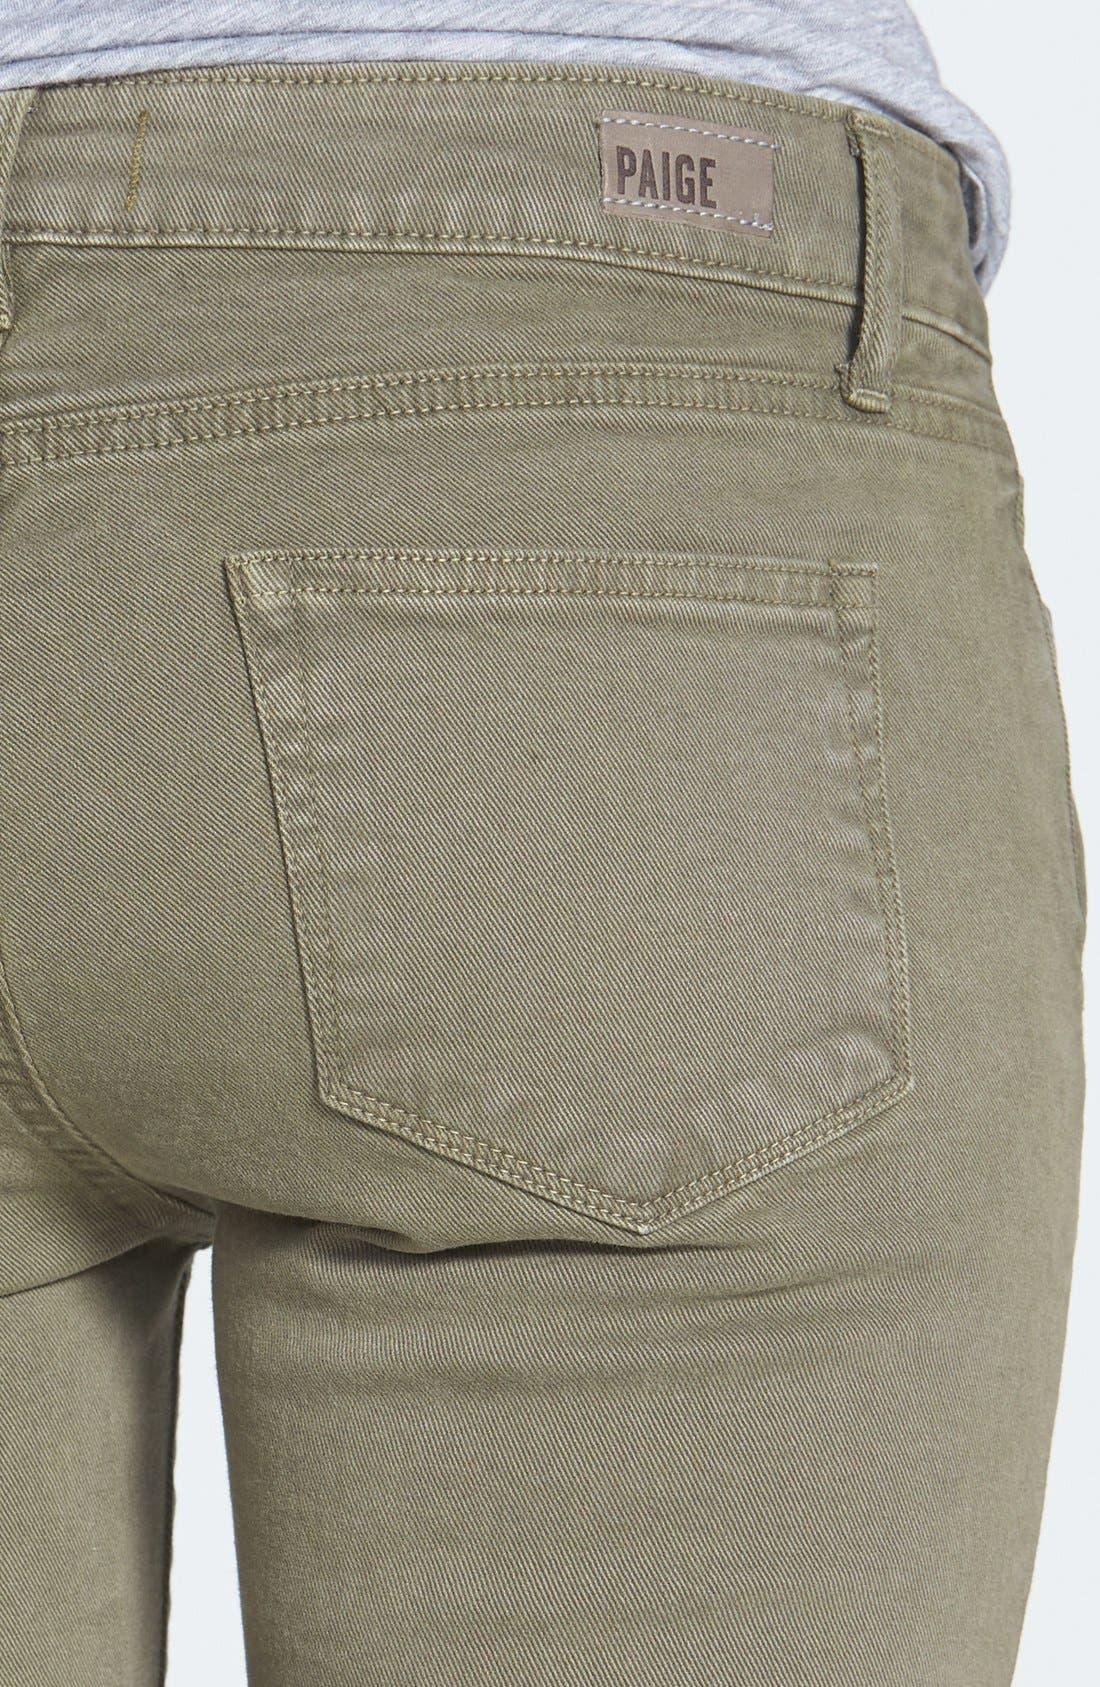 Alternate Image 3  - Paige Denim 'Jane' Zip Detail Ultra Skinny Ankle Jeans (Fatigue Green)